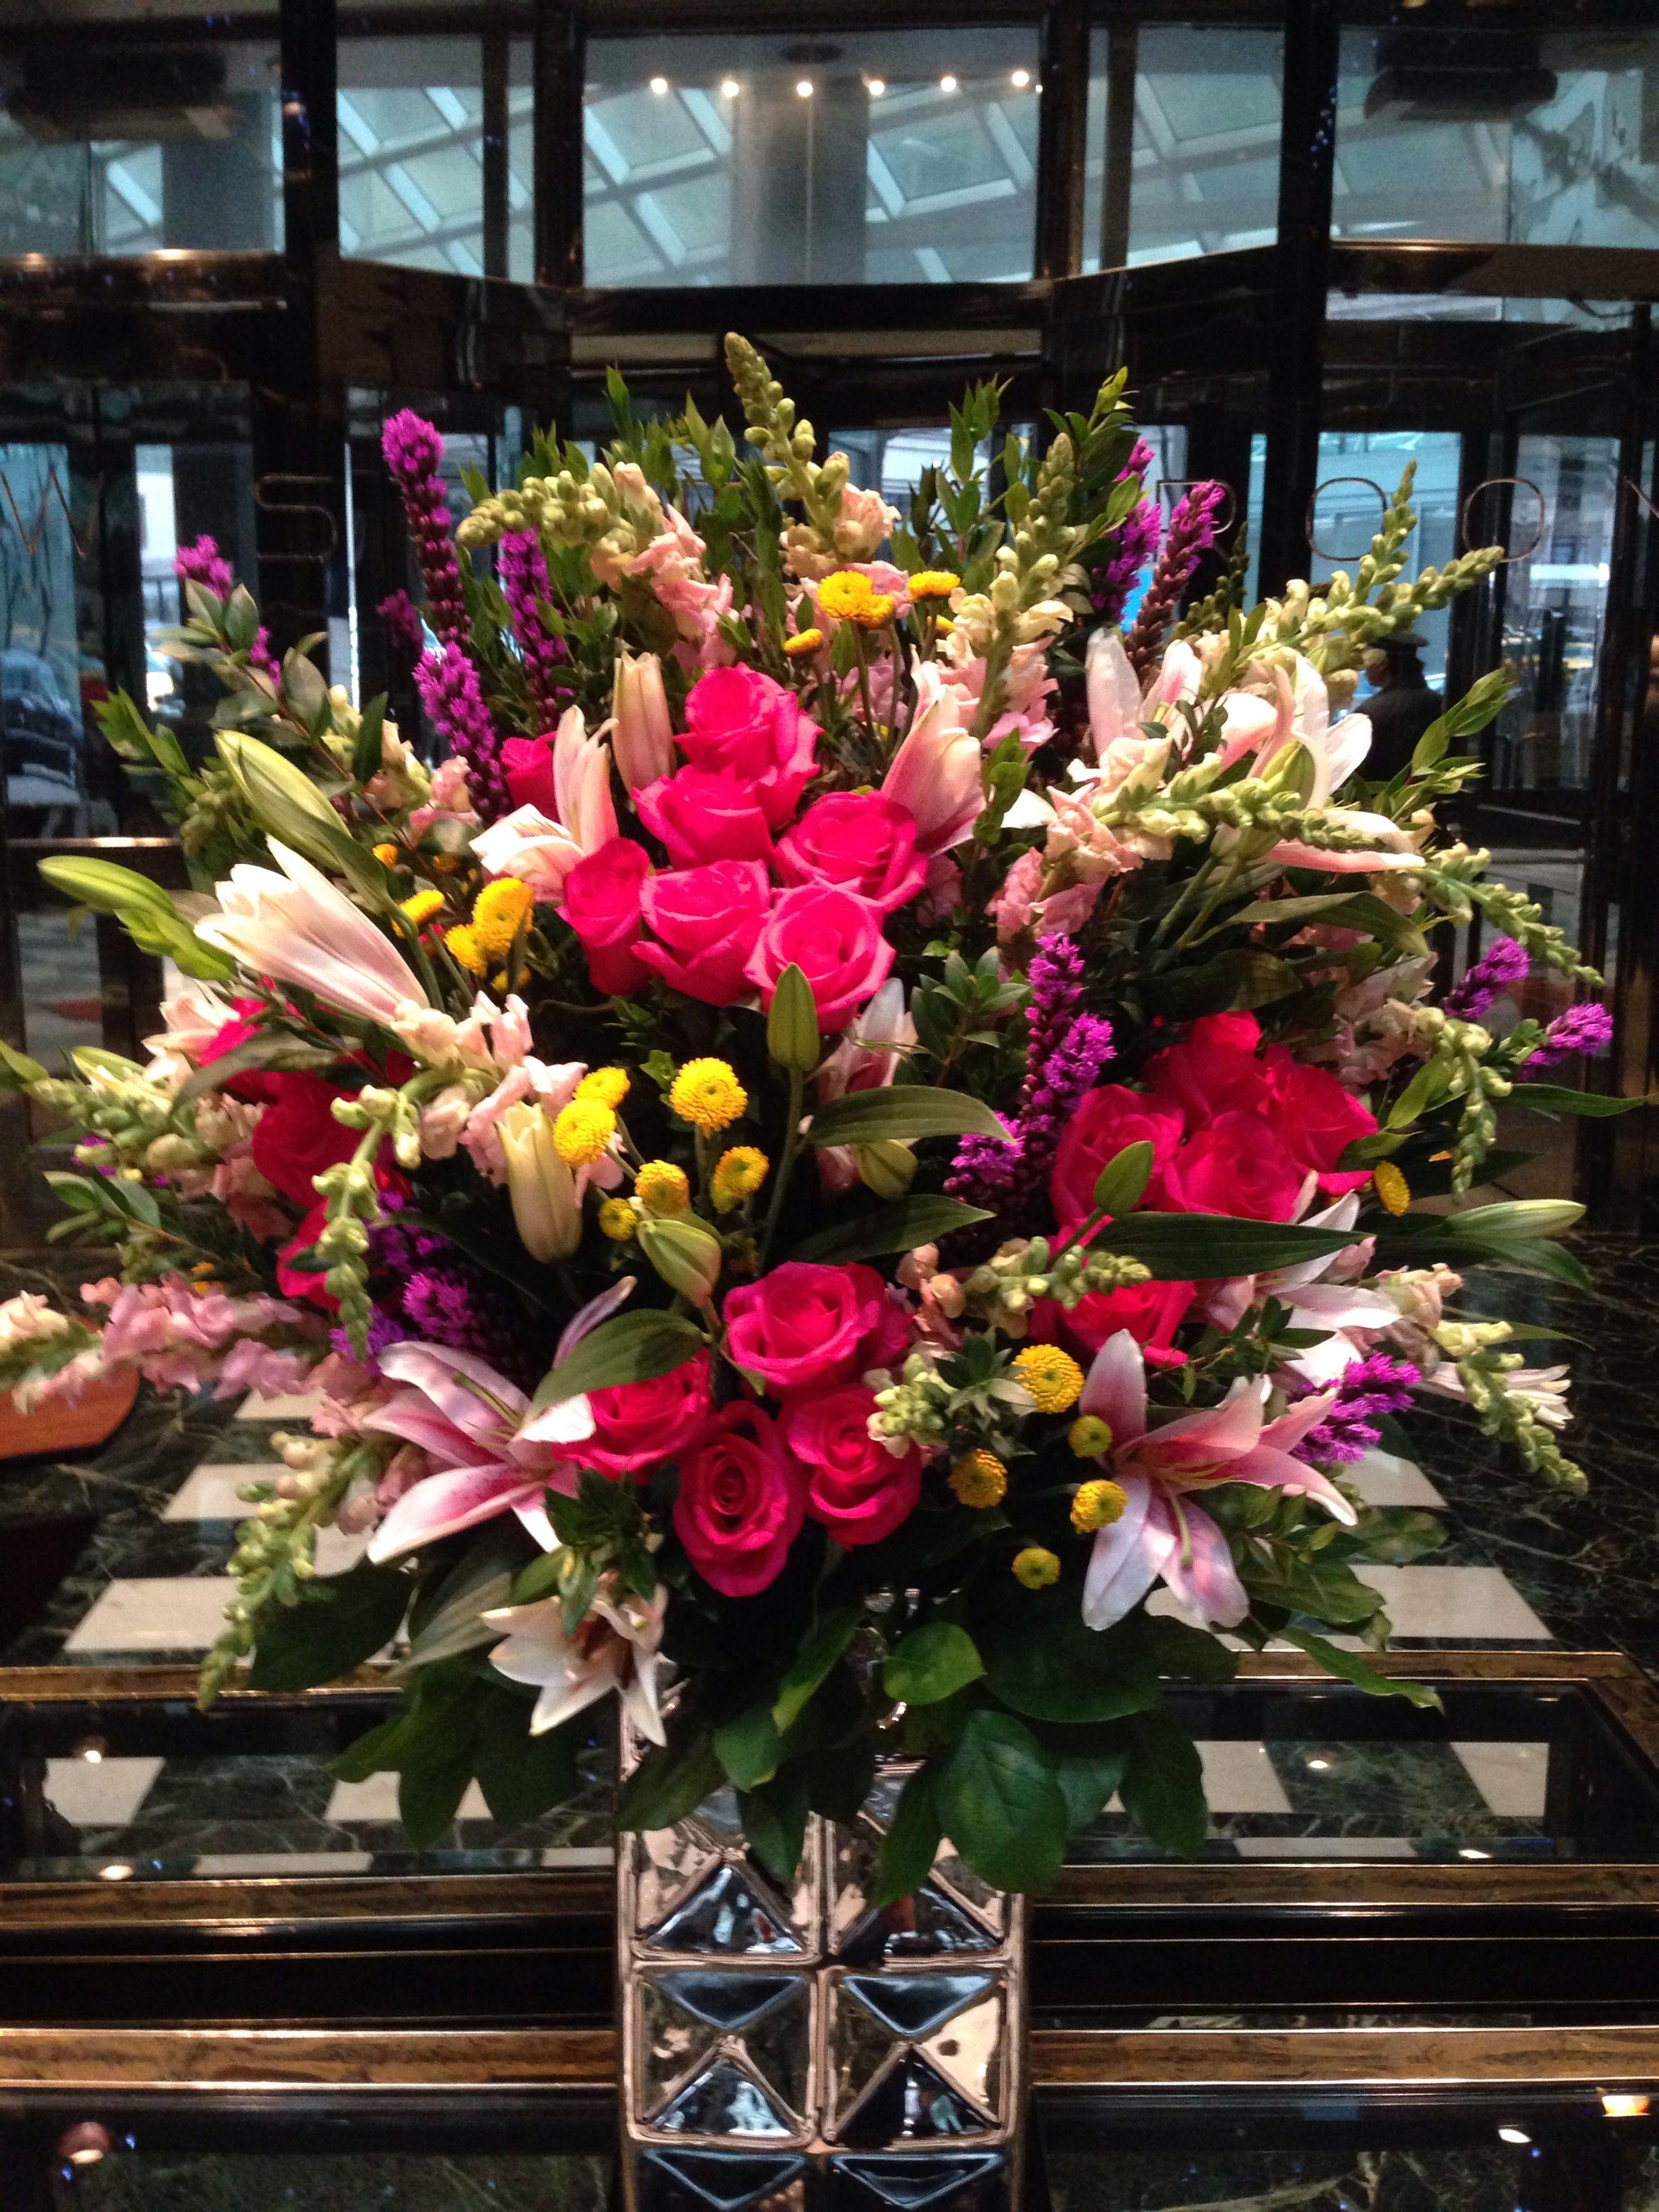 Hotel design Hotel flower arrangements, Hotel flowers